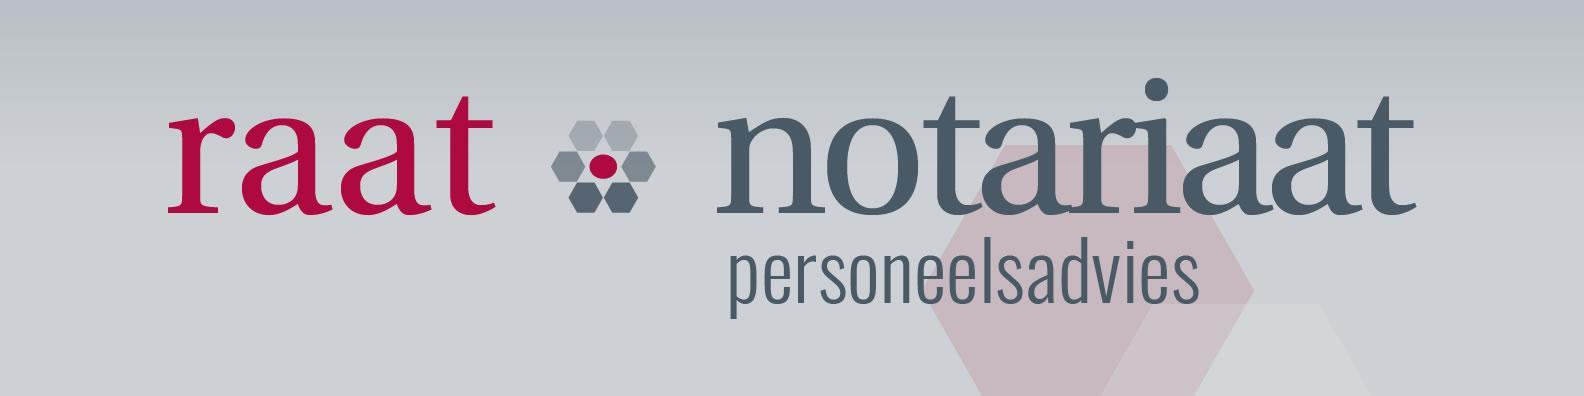 Kandidaat- notaris PFR